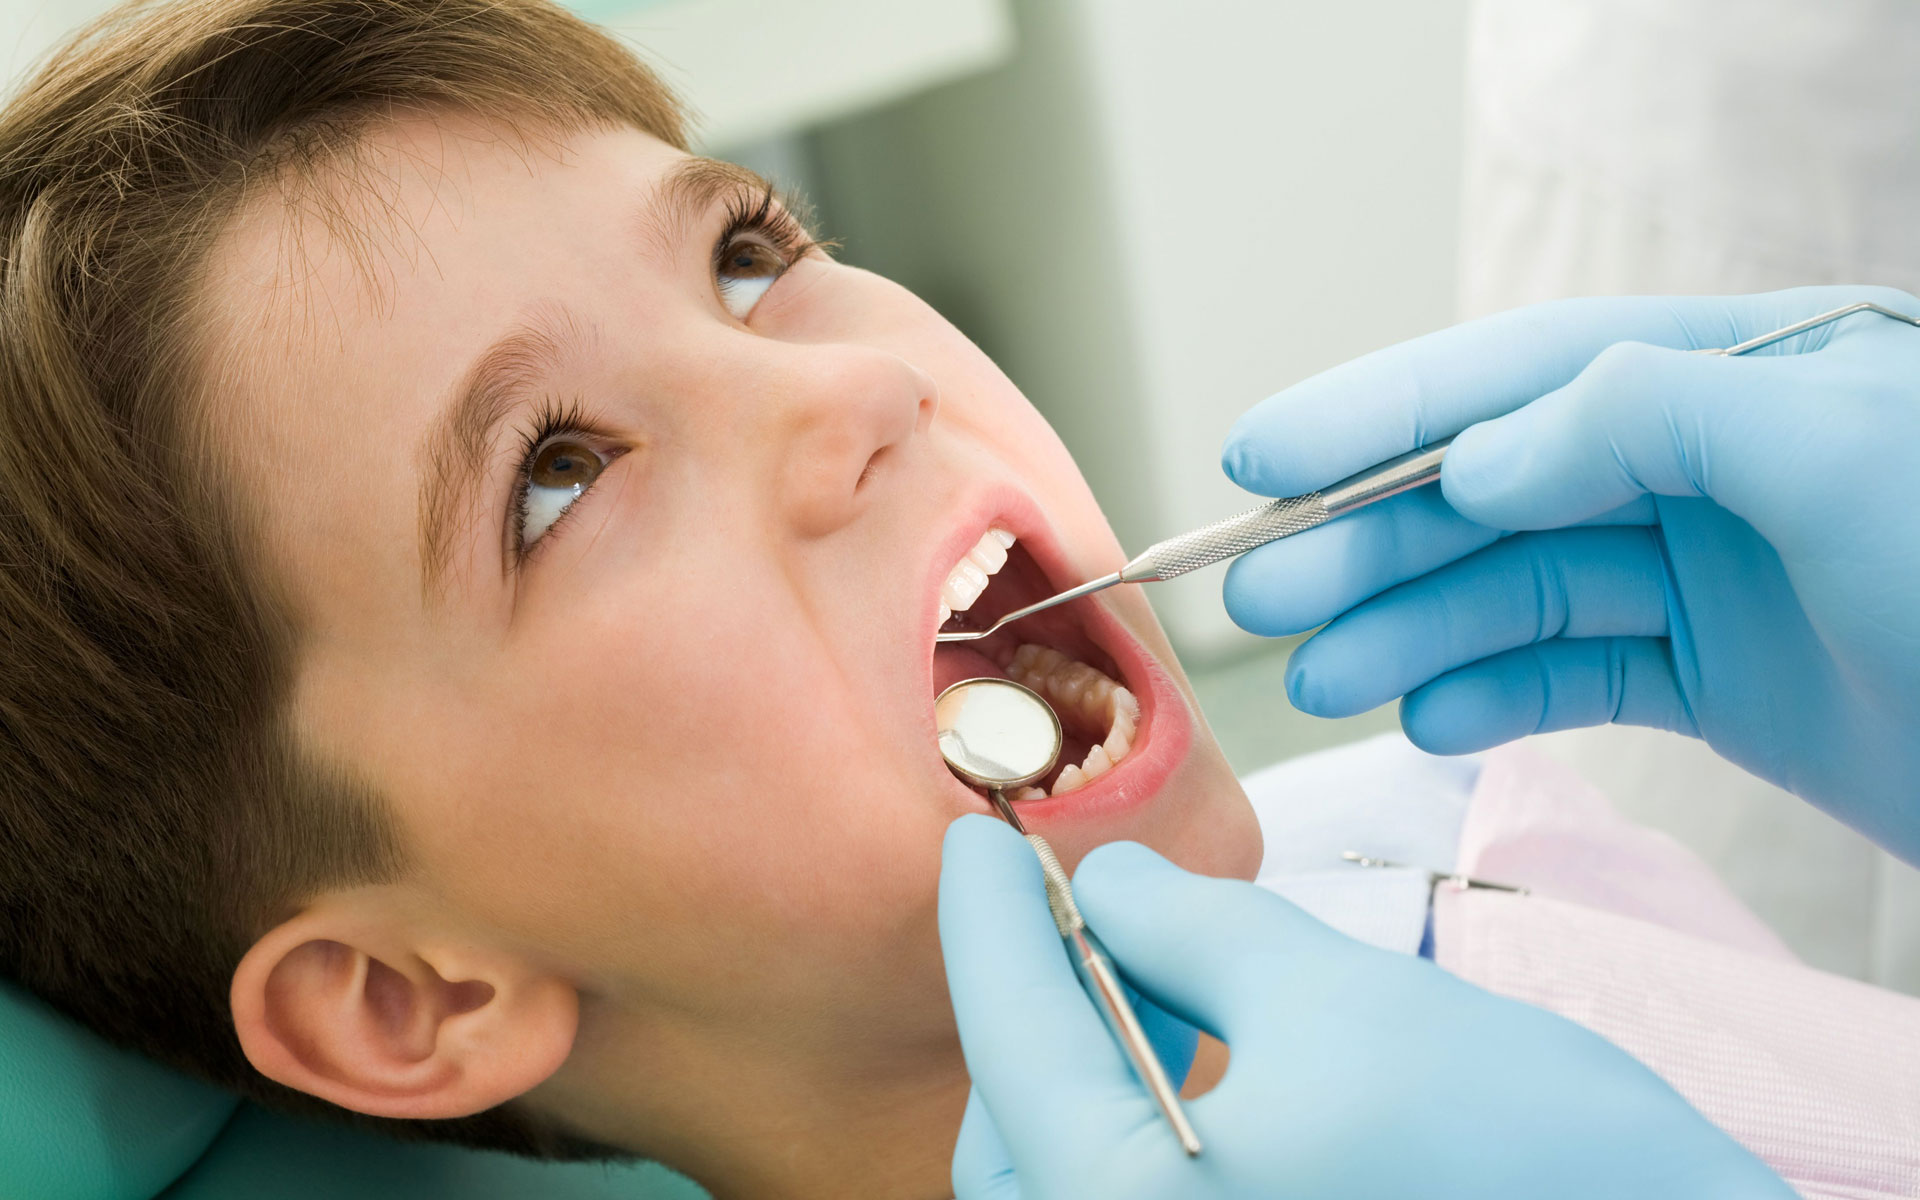 Dental Check Up Chino - Your Chino Dentist